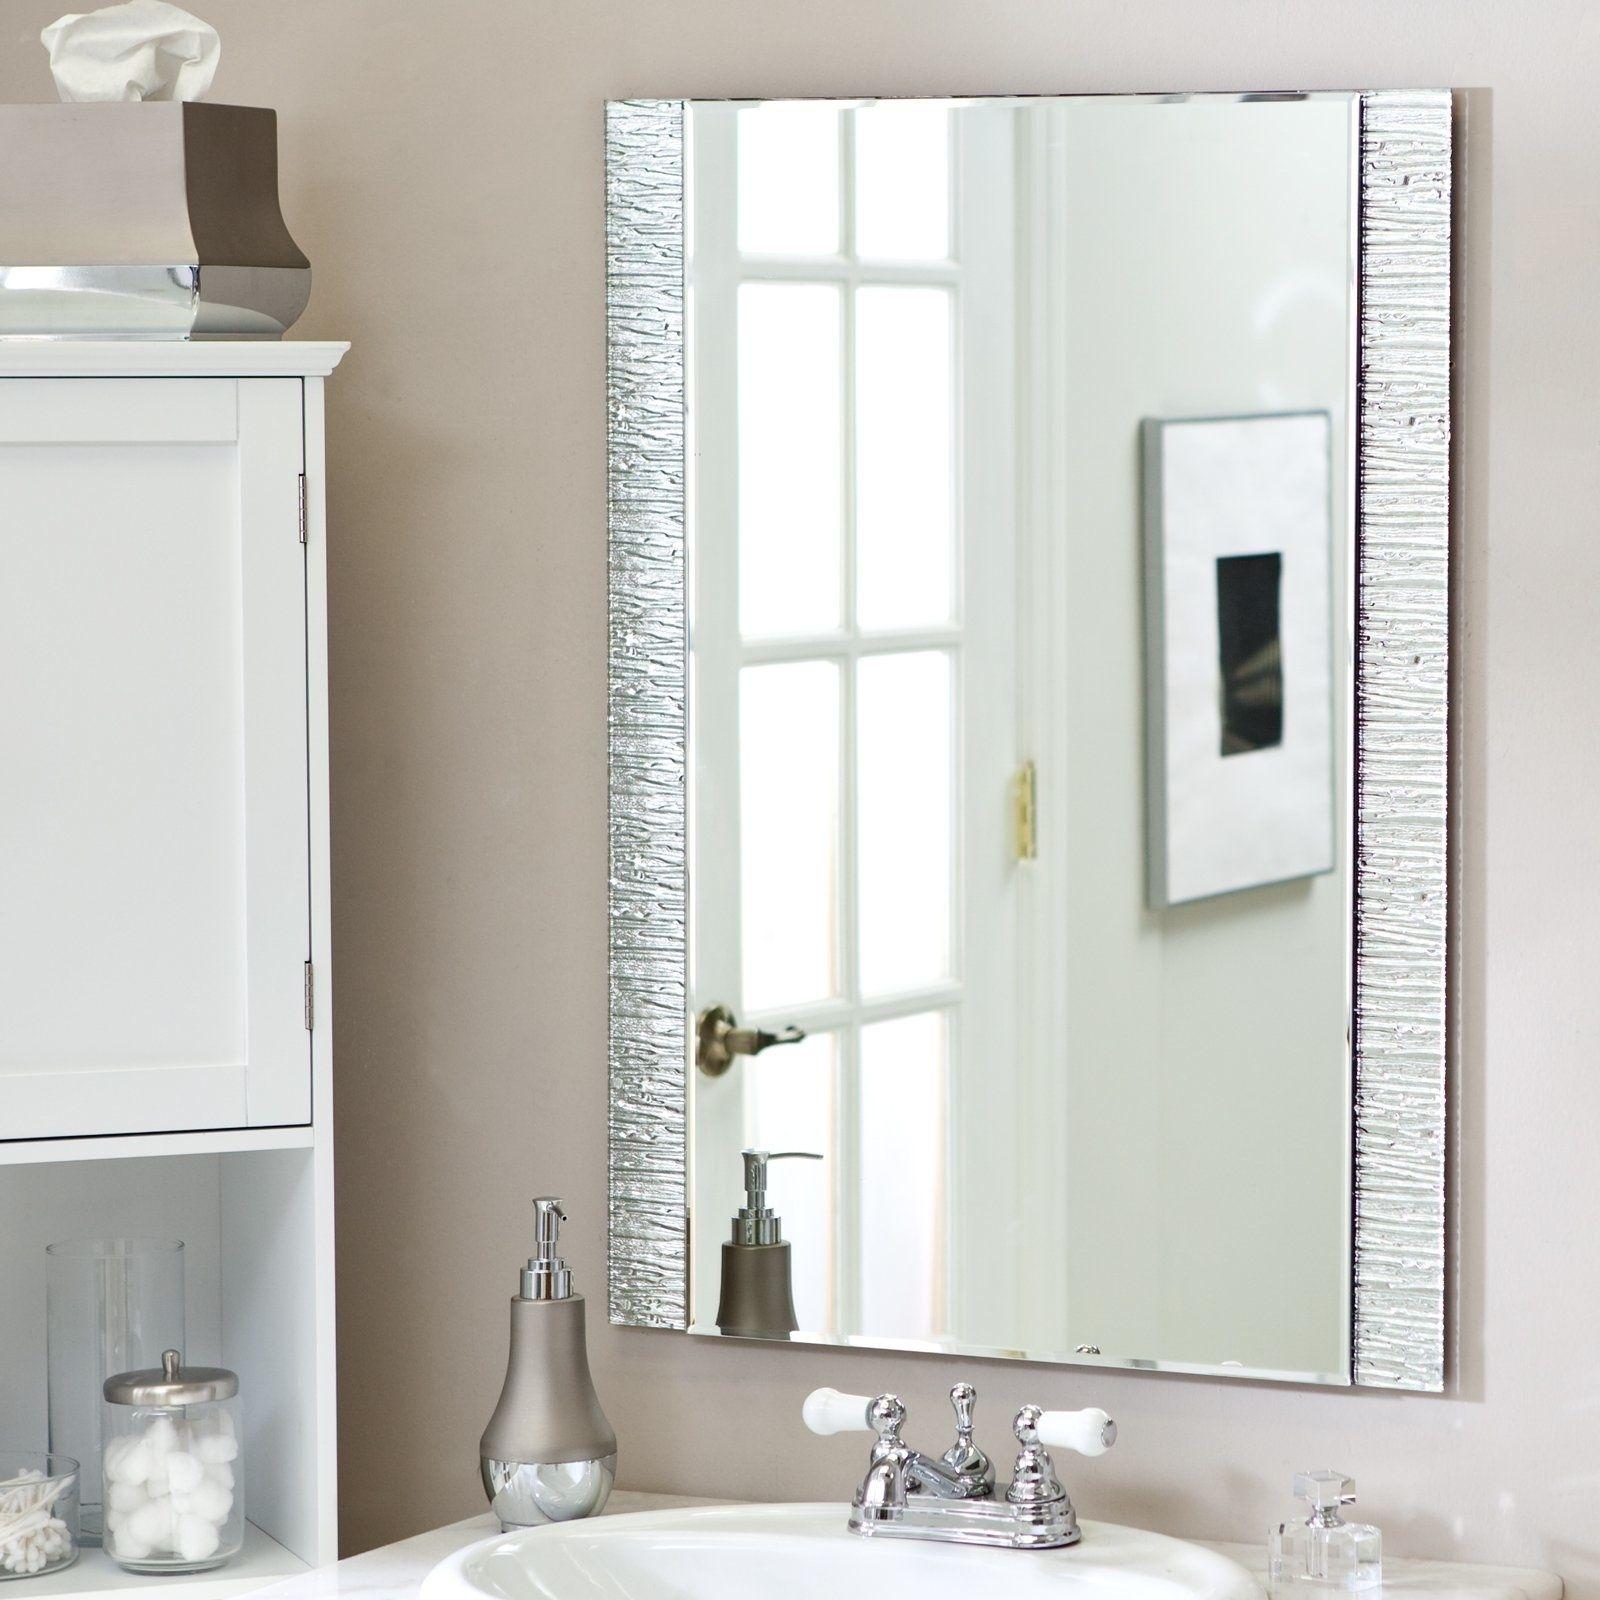 Frame Bathroom Mirror Without Glue | http://drrw.us | Pinterest ...